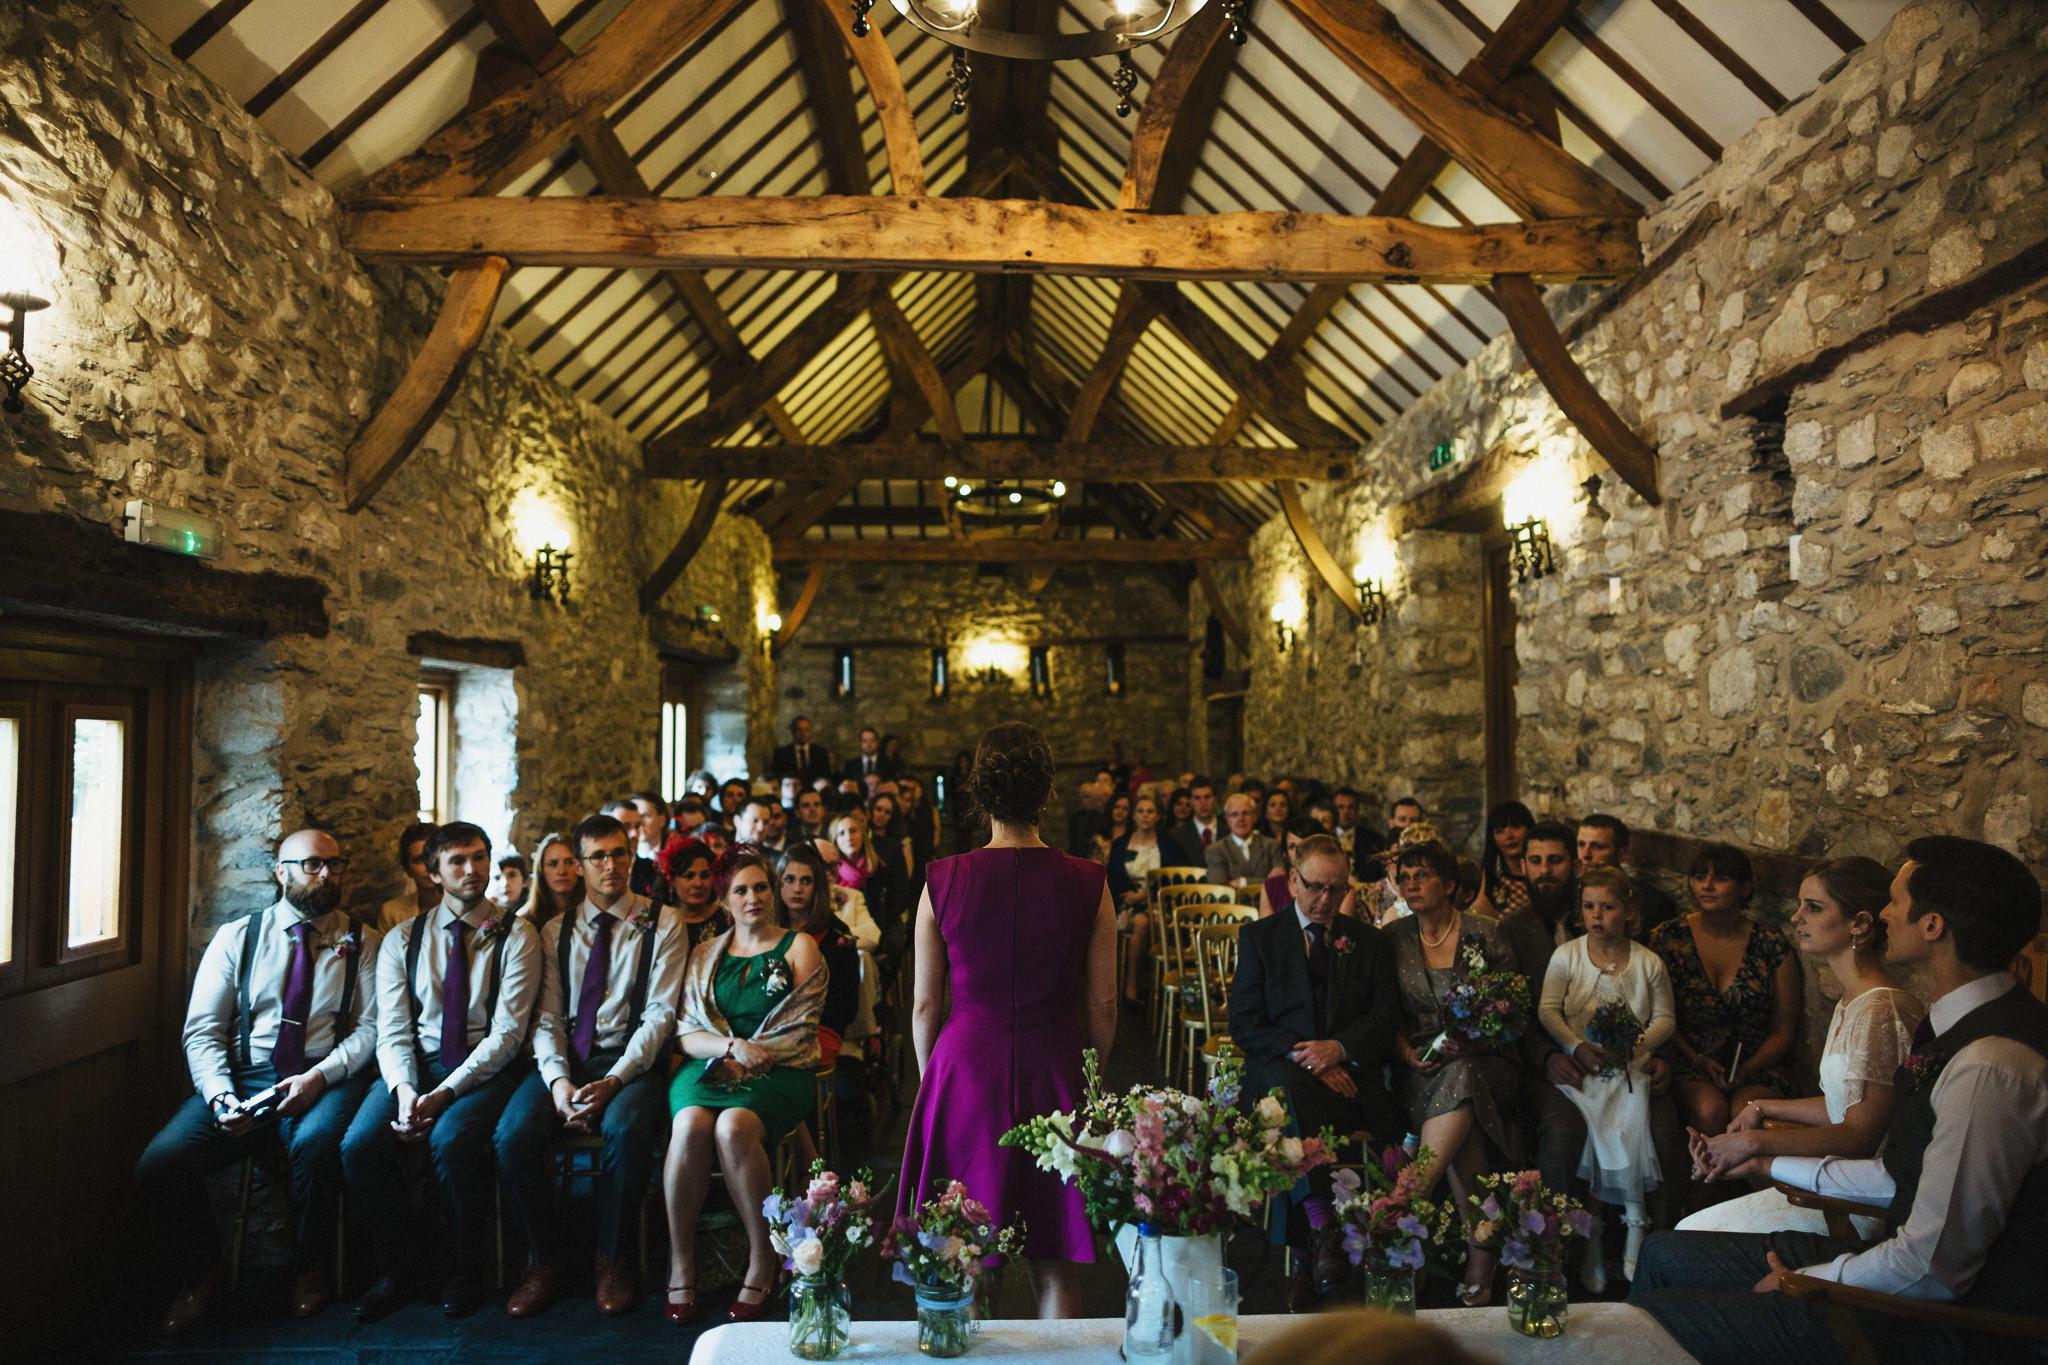 plas-isaf-corwen-north wales wedding-photography-photographer-91028